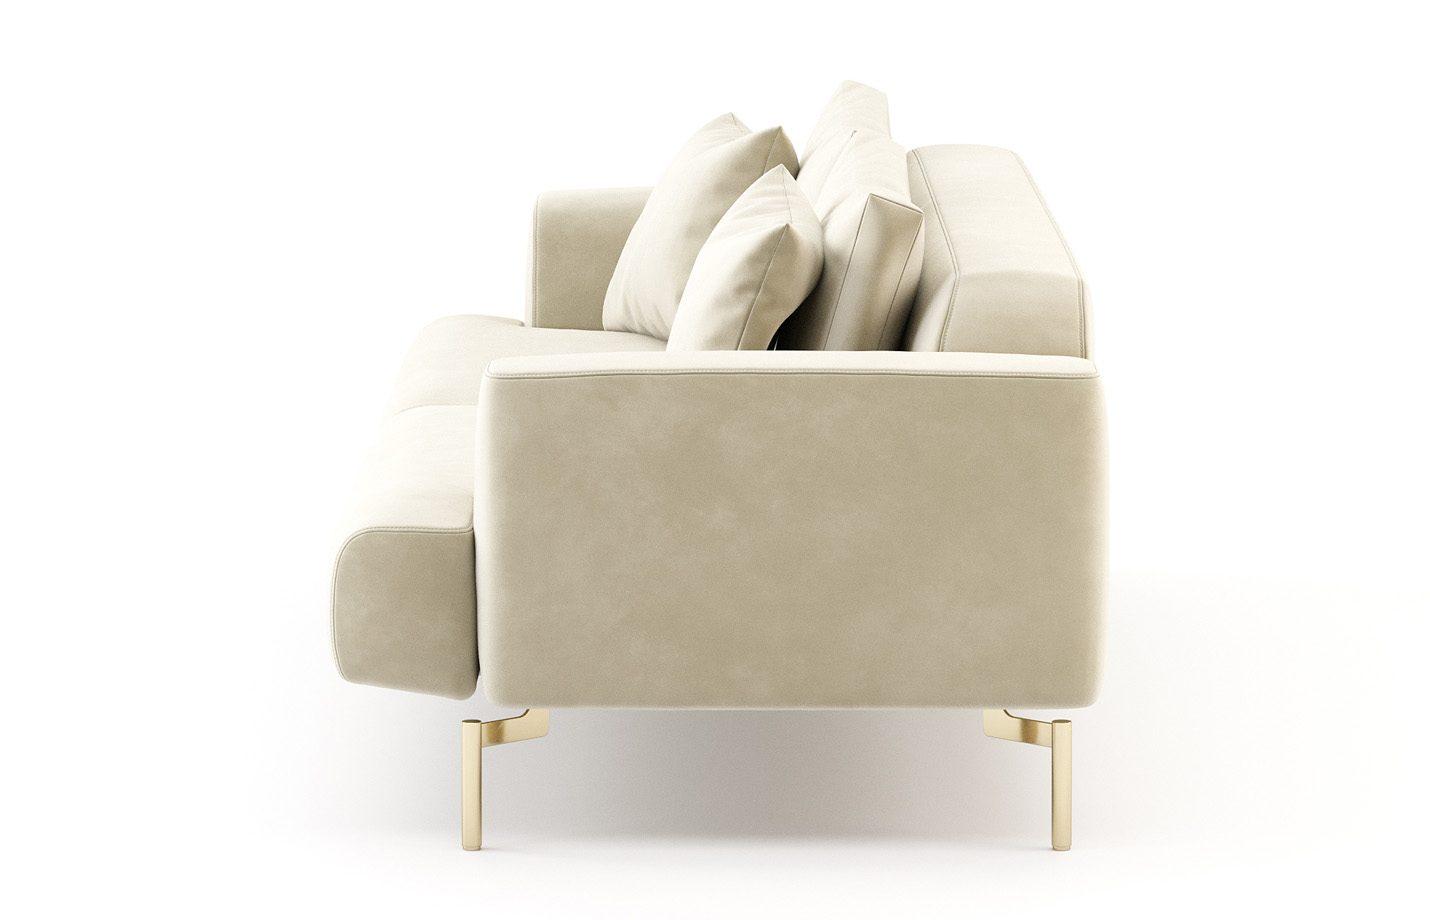 Miyana-Sofa-by-fabiia-furniture-signature-3